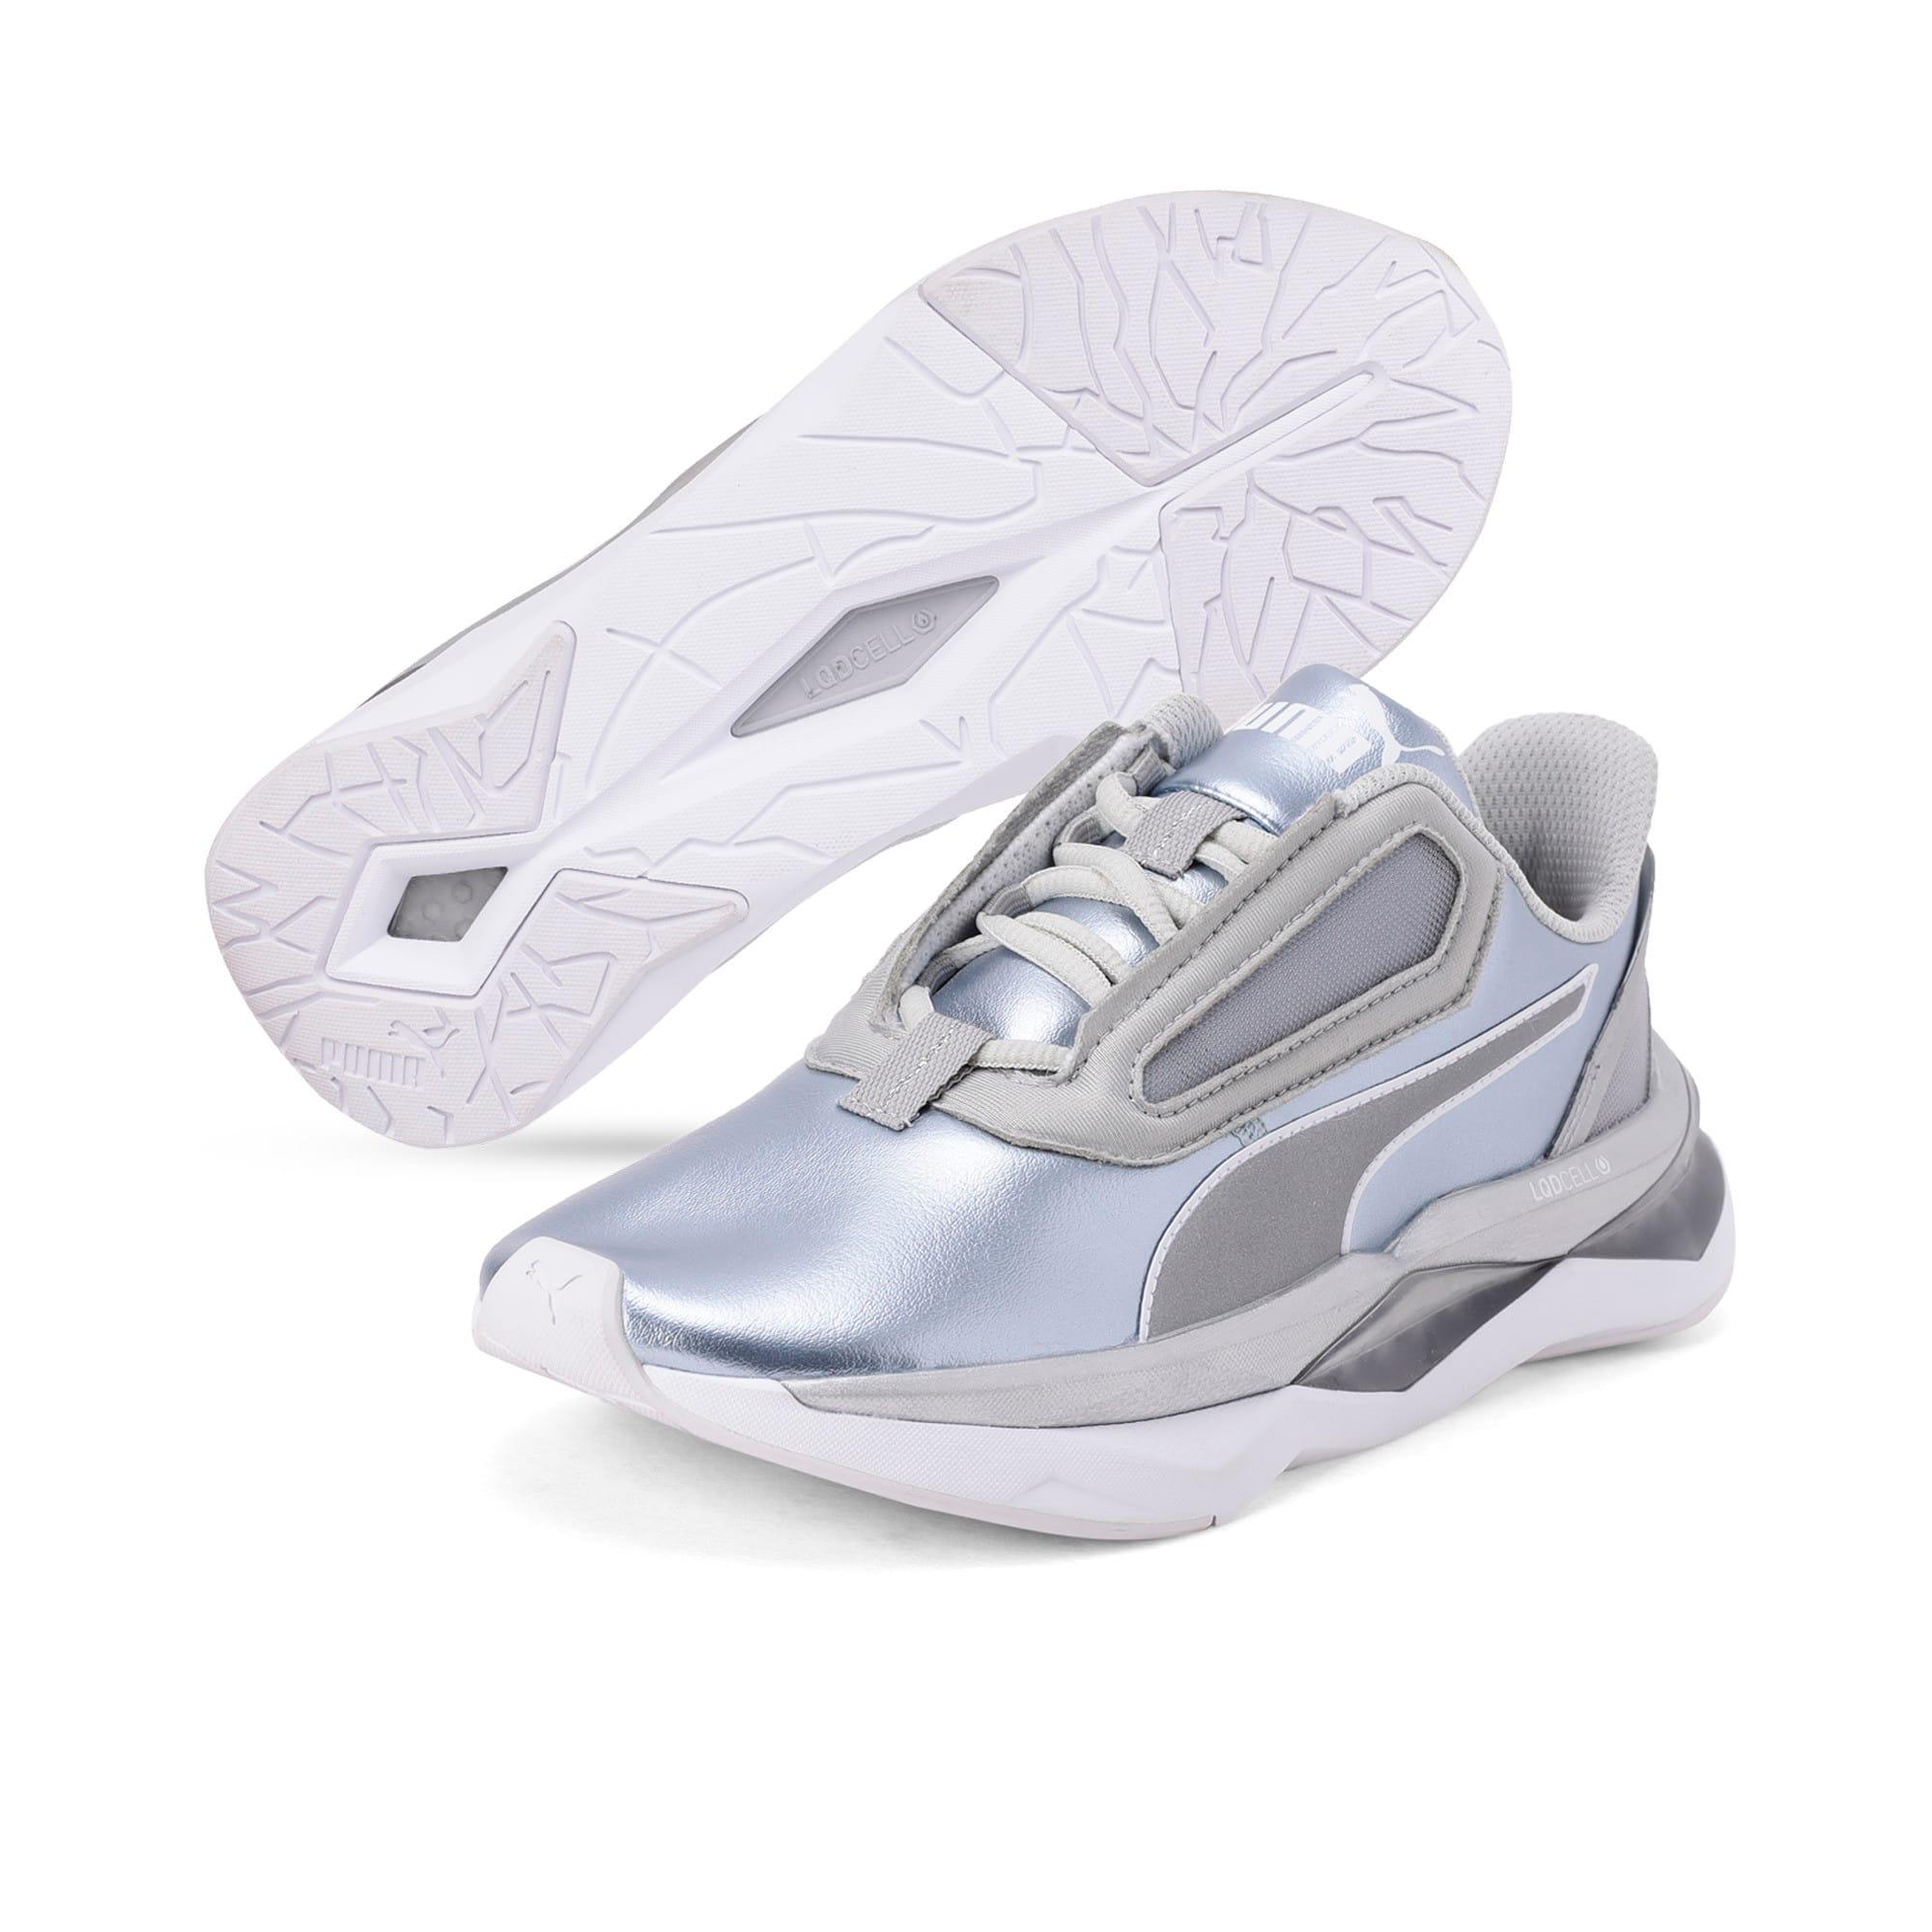 Thumbnail 2 of LQDCELL Shatter XT Metal Women's Training Shoes, Puma Silver-Puma White, medium